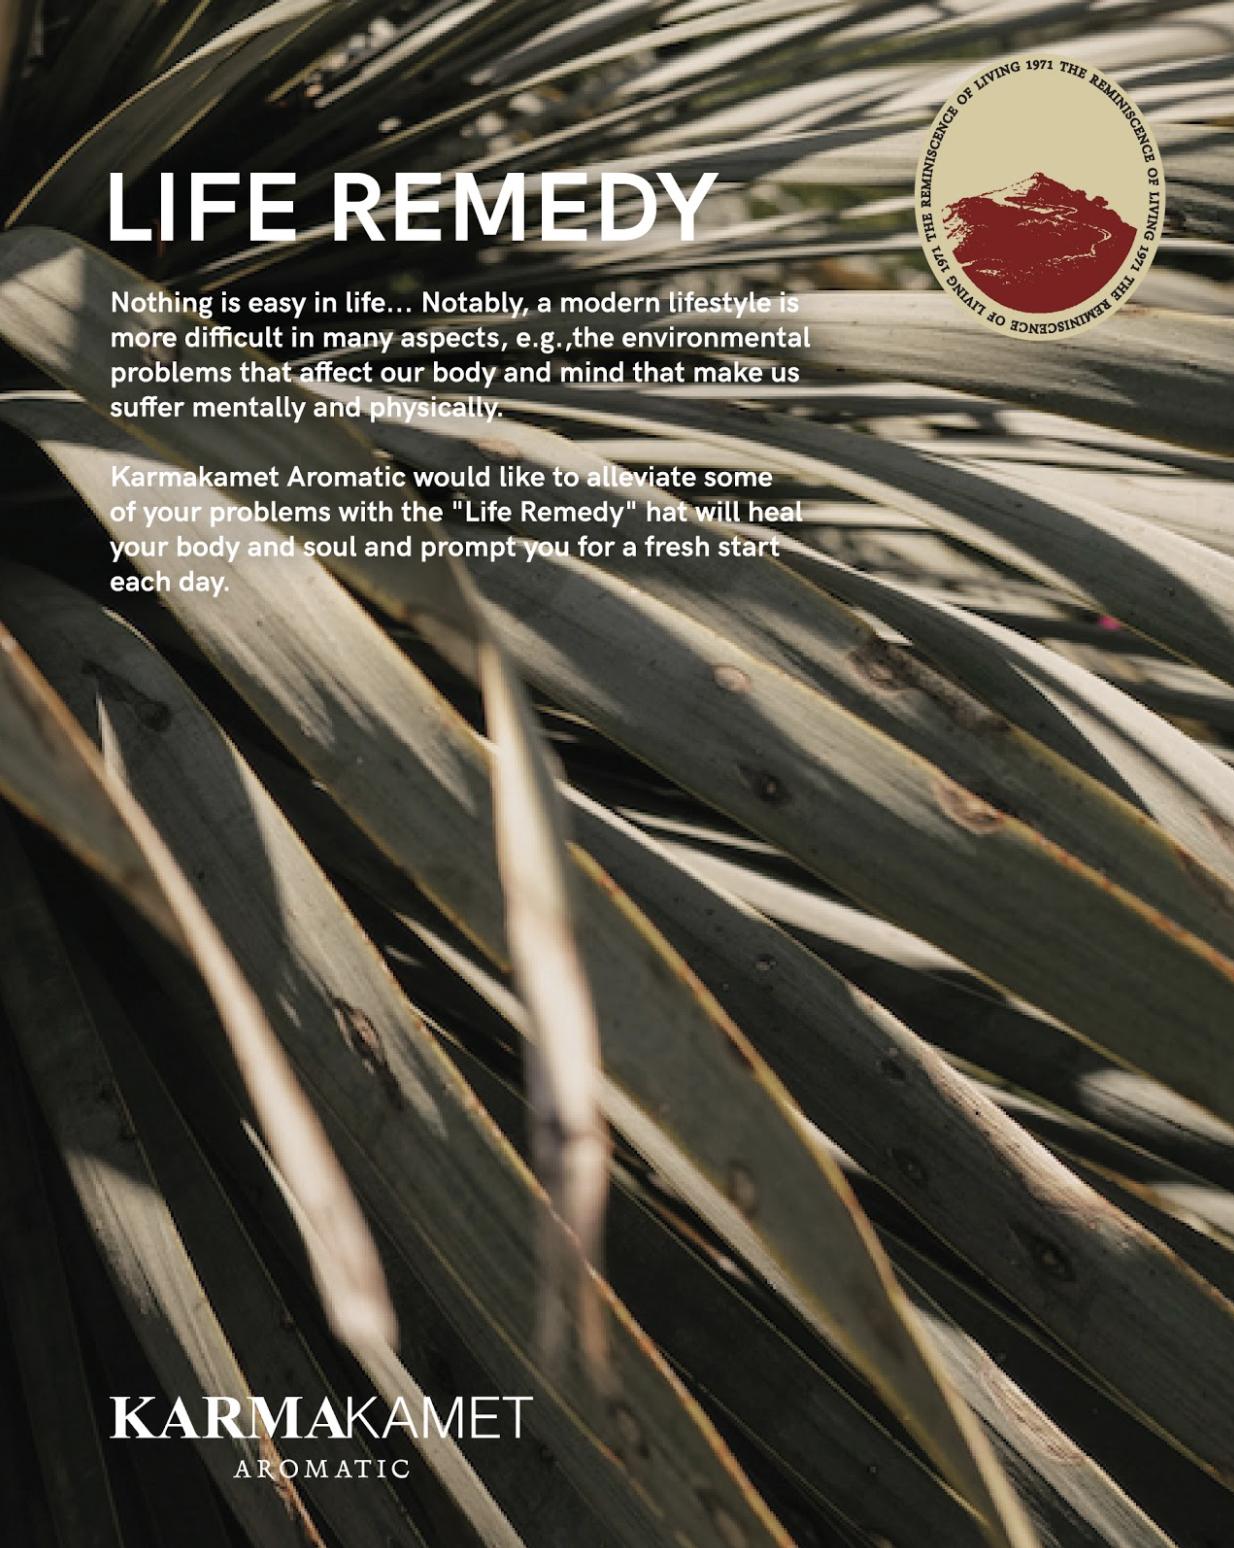 Karmakamet Life Remedy